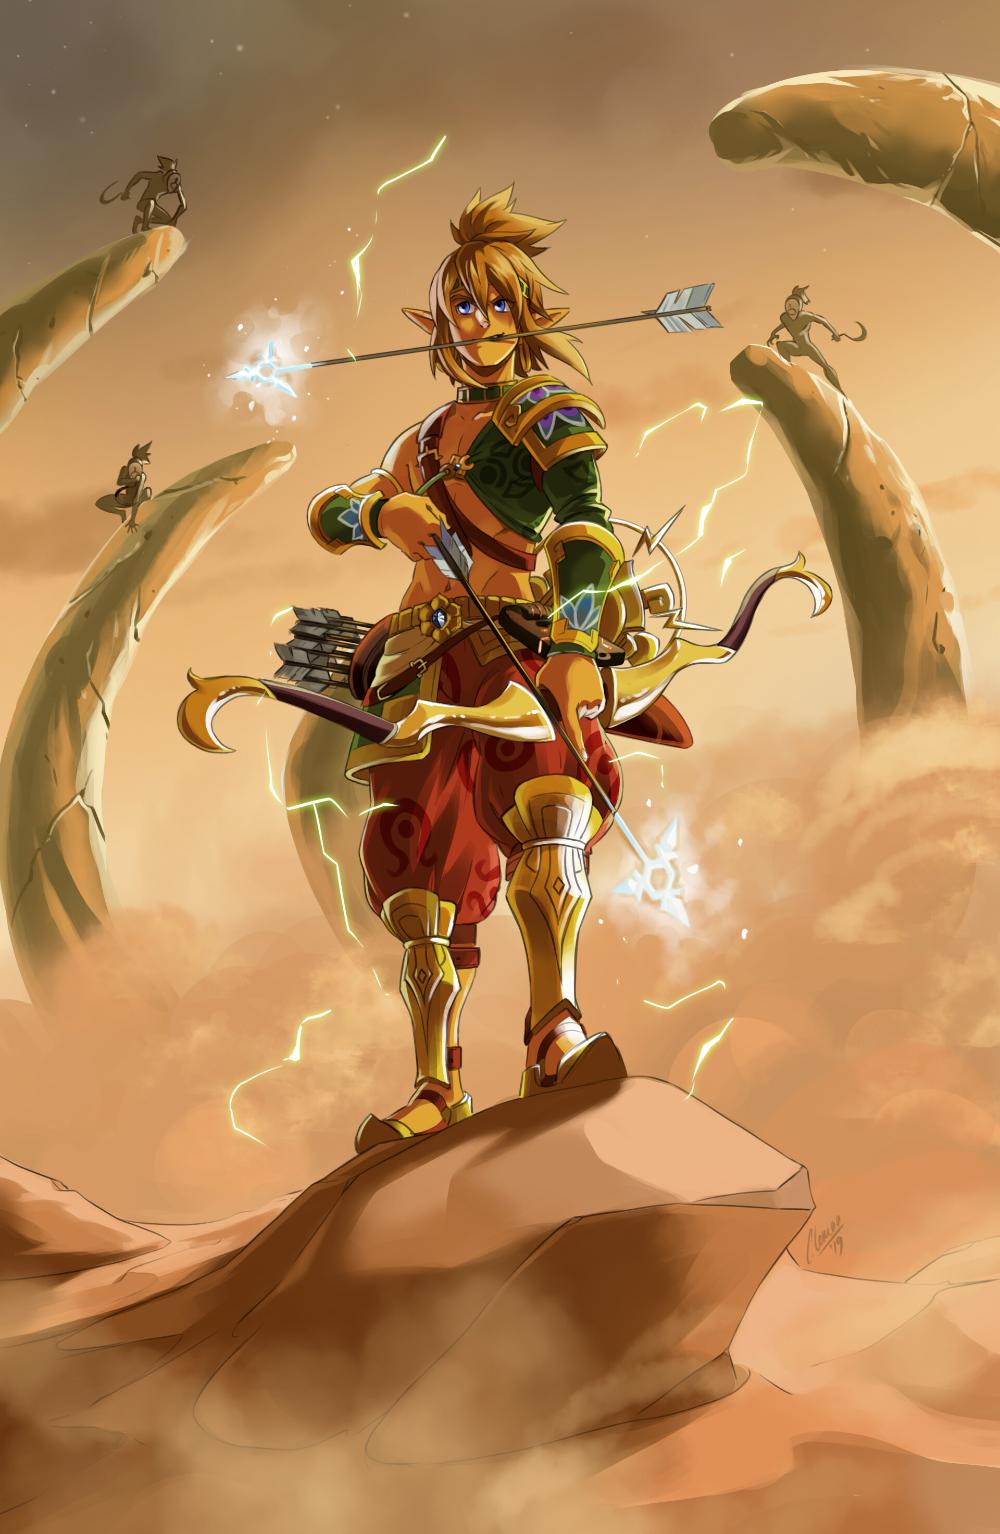 Artstation Link The Legend Of Zelda Breath Of The Wild Cynthia Leman Legend Of Zelda Breath Legend Of Zelda Memes Legend